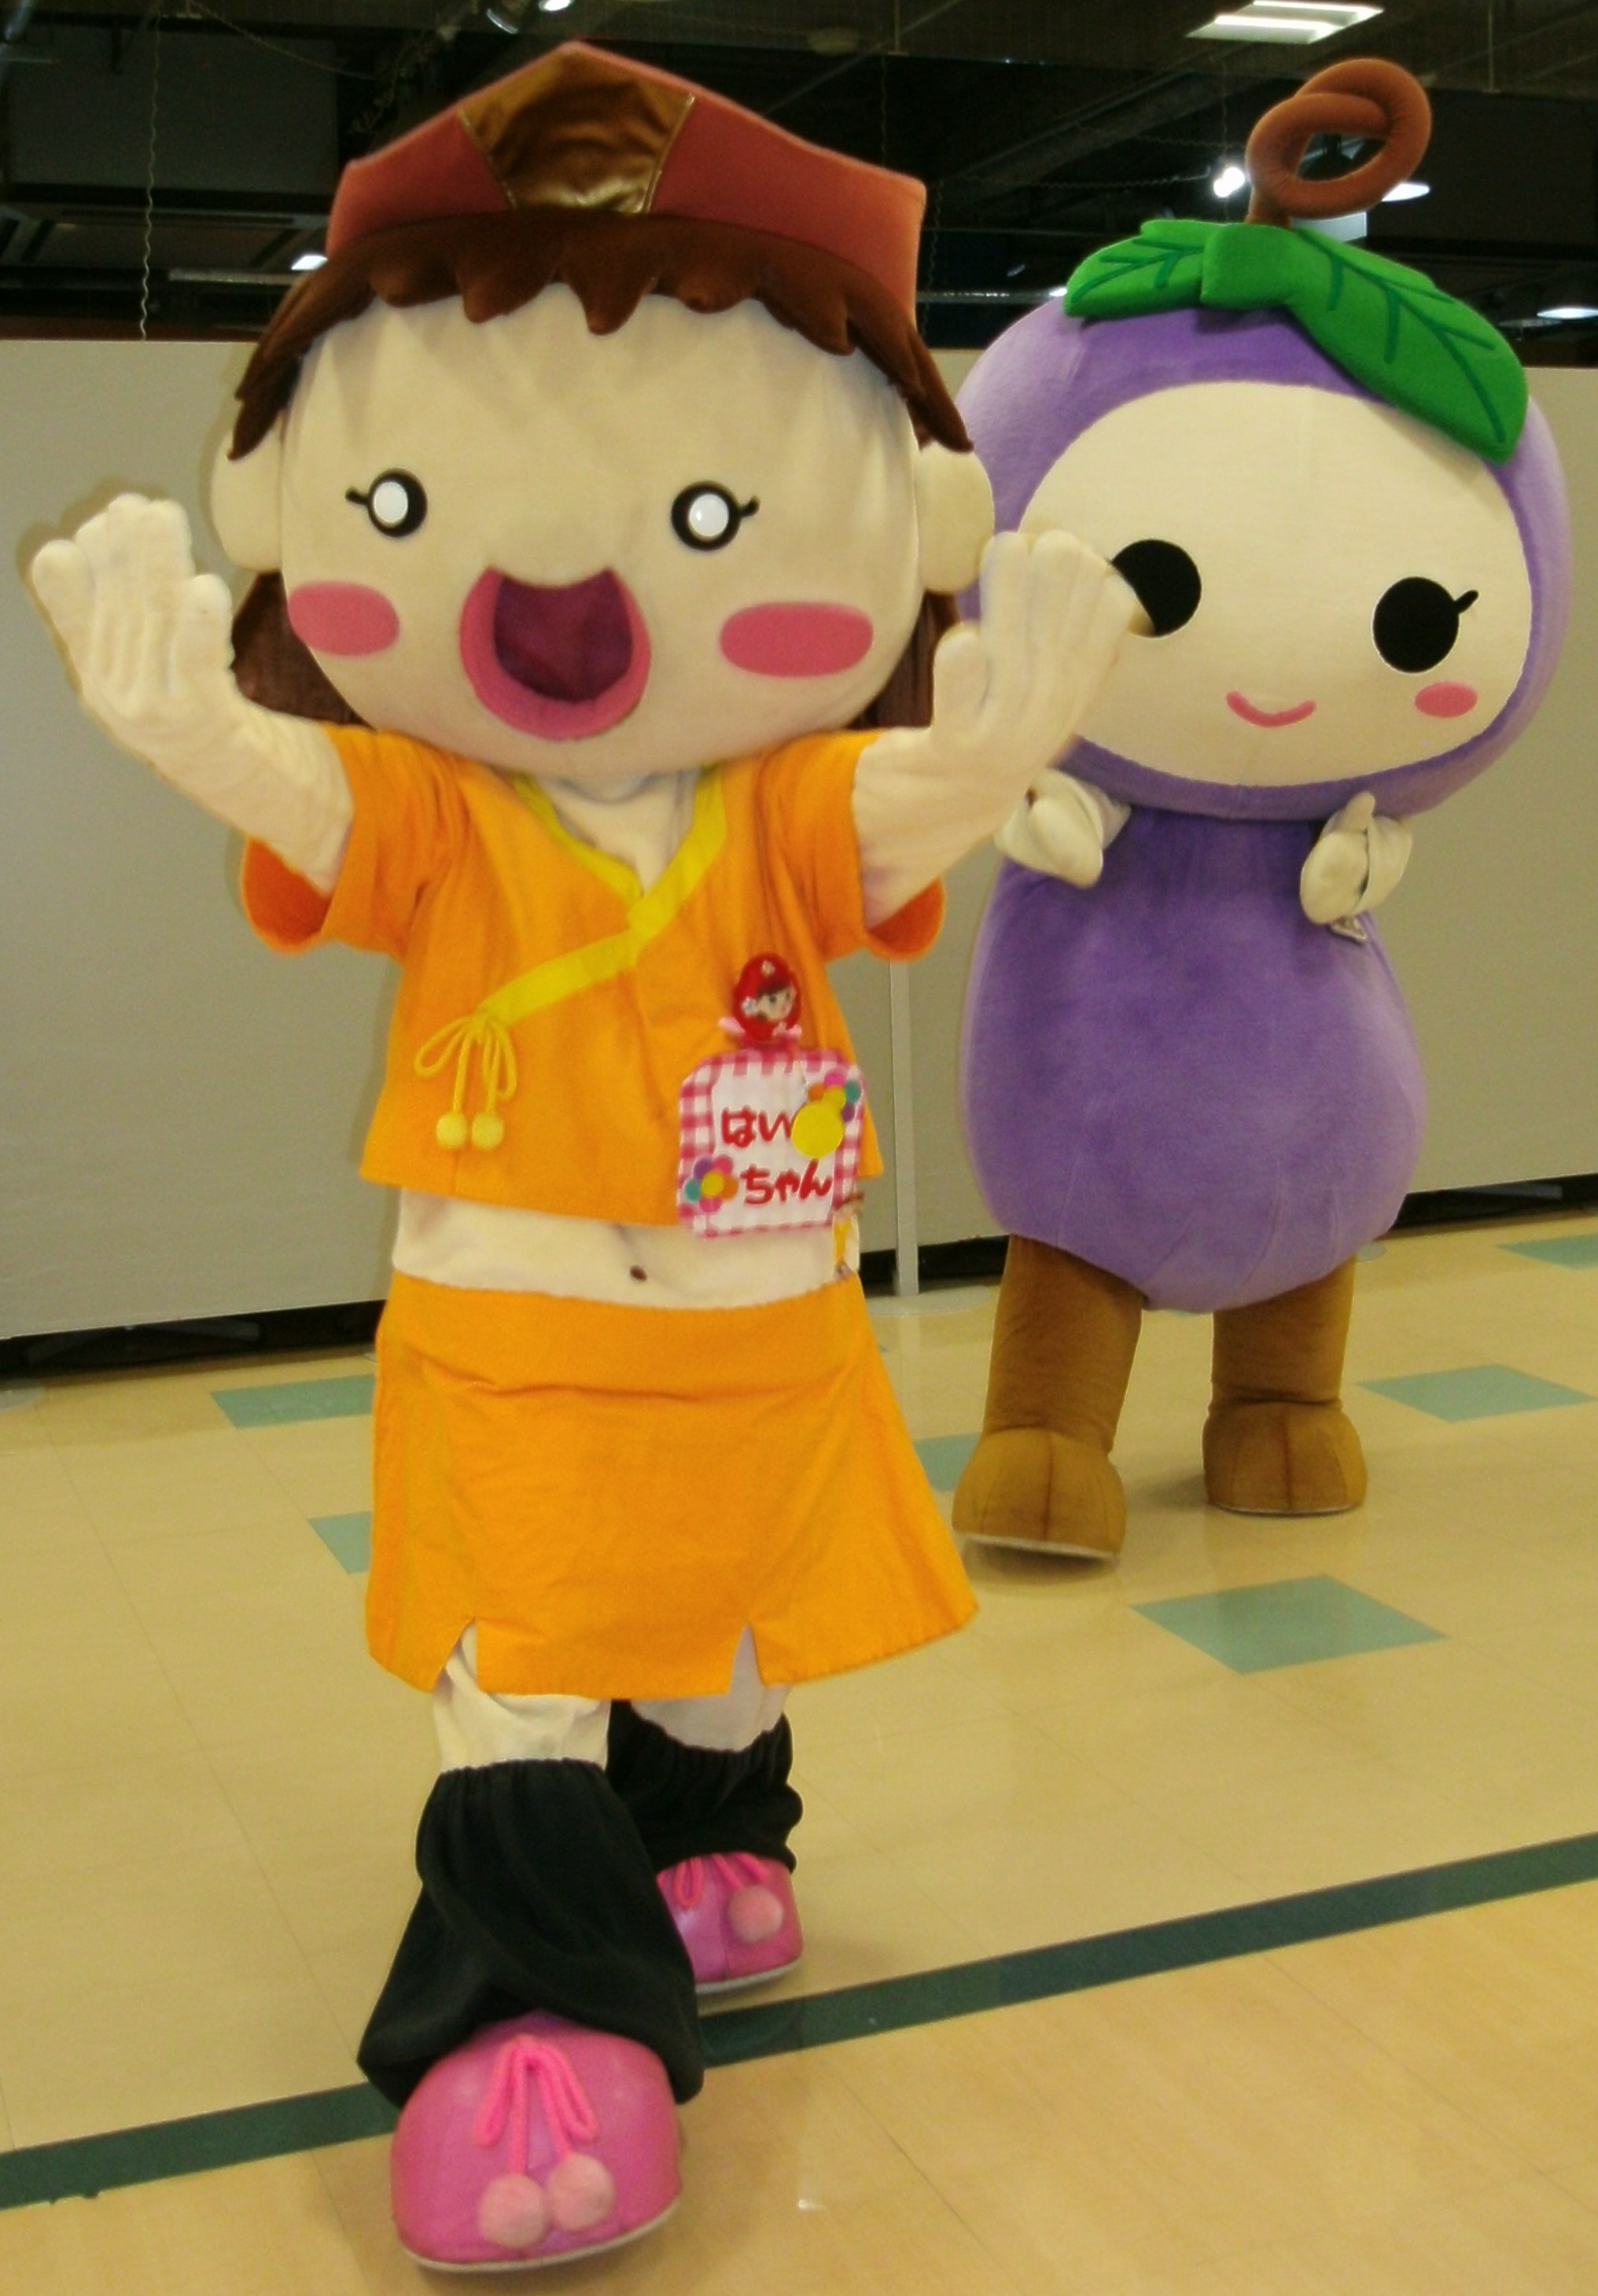 Haiku-chan and Budorin 1 by yellowmocha